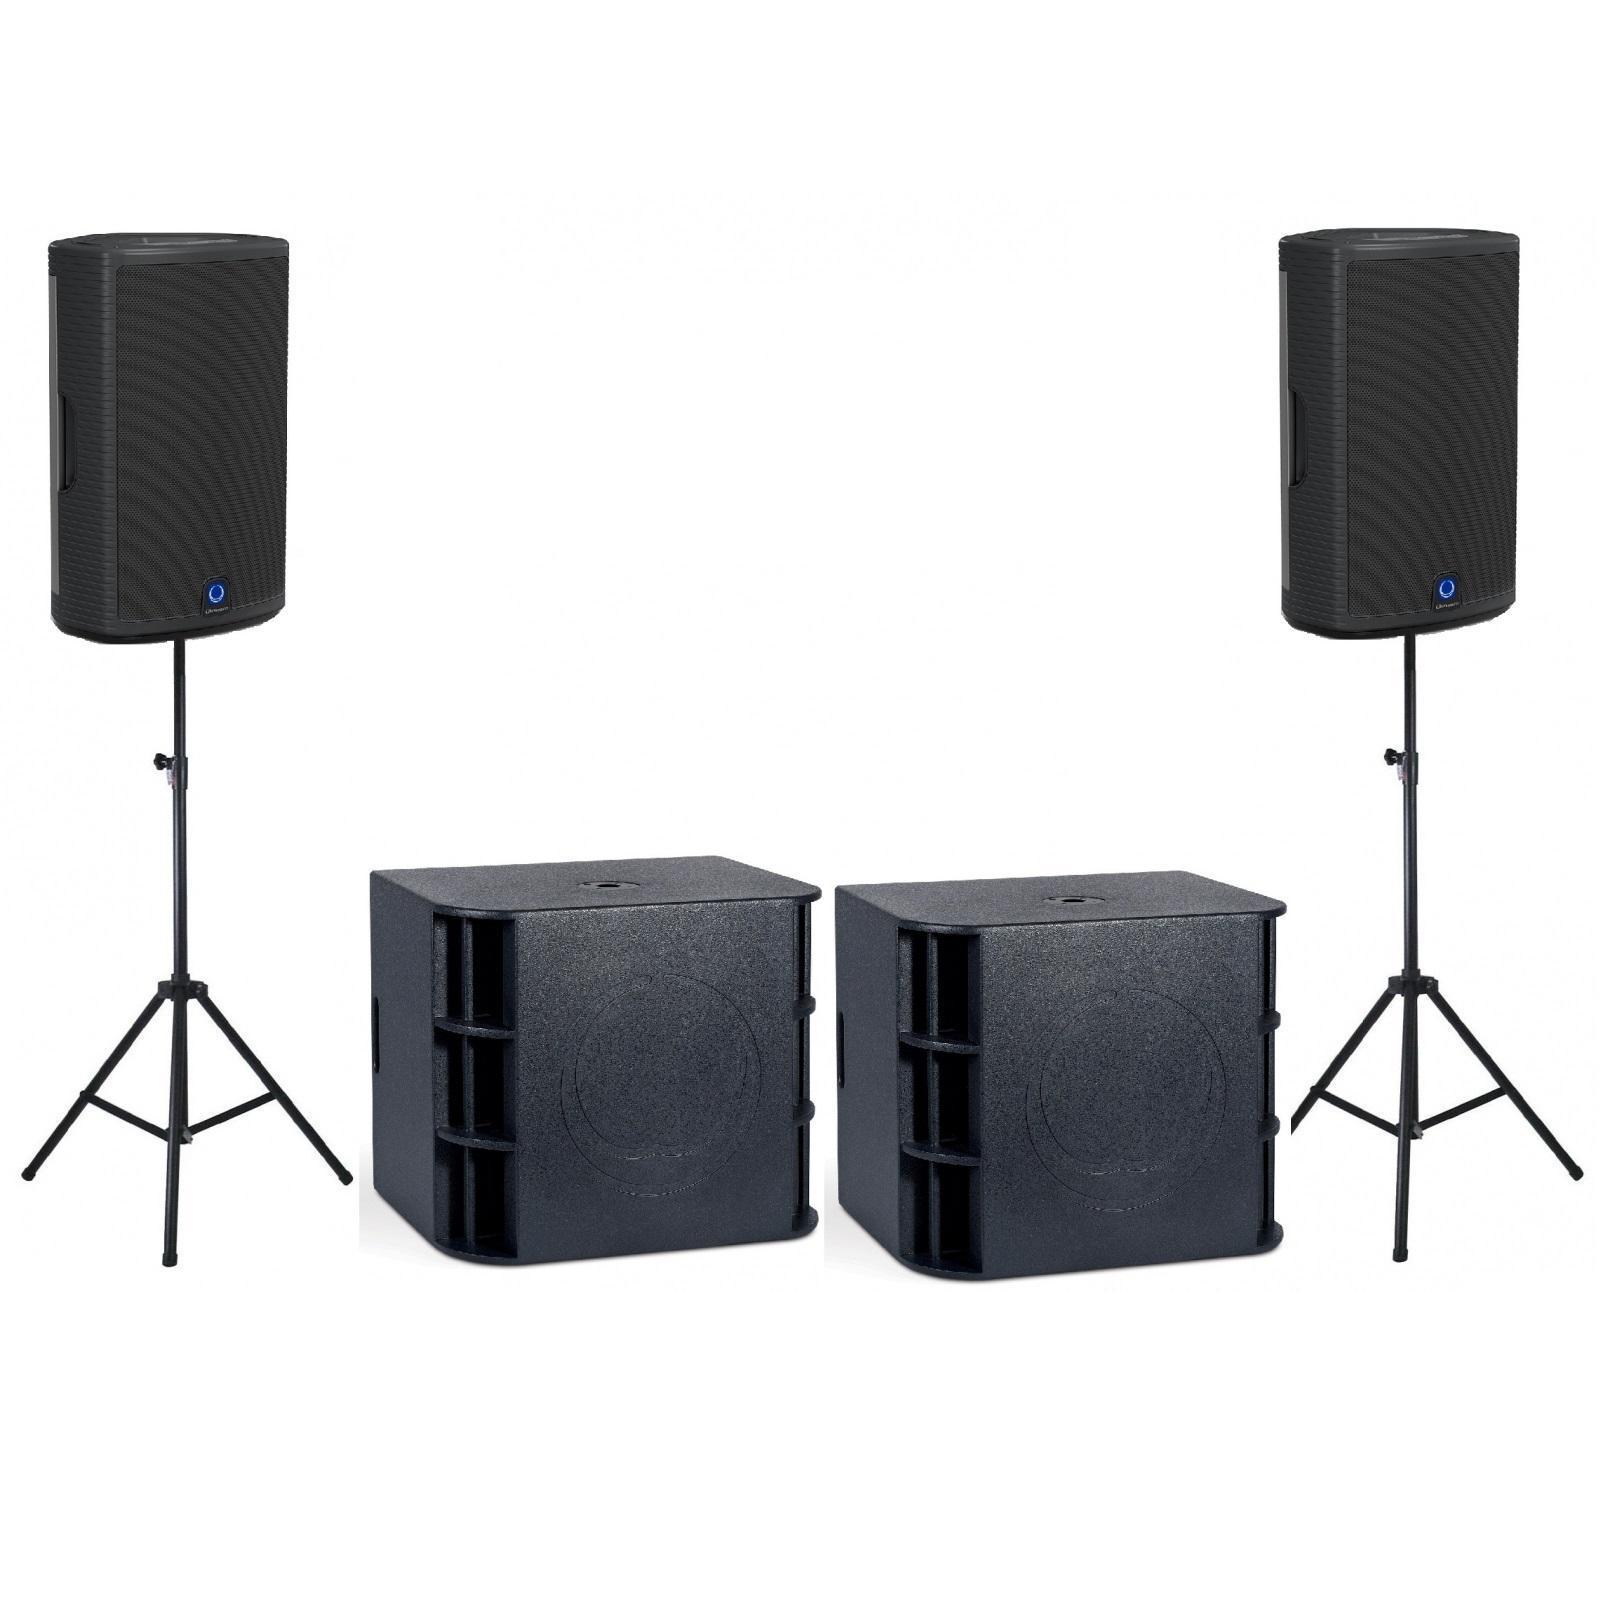 4400w turbosound m12 m15b system lizard audio ltd. Black Bedroom Furniture Sets. Home Design Ideas